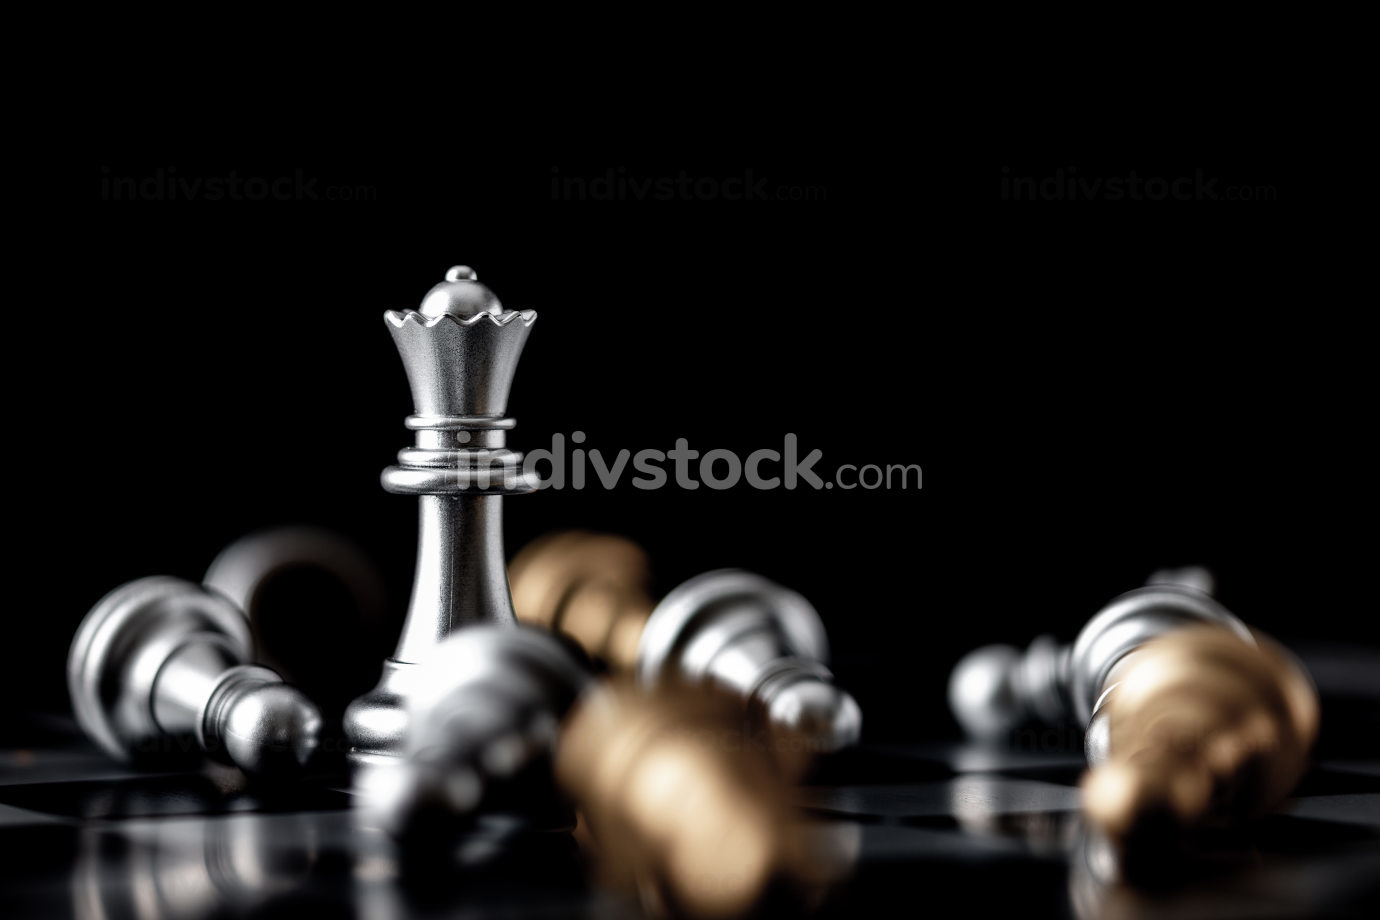 Queen standing in the midst of falling